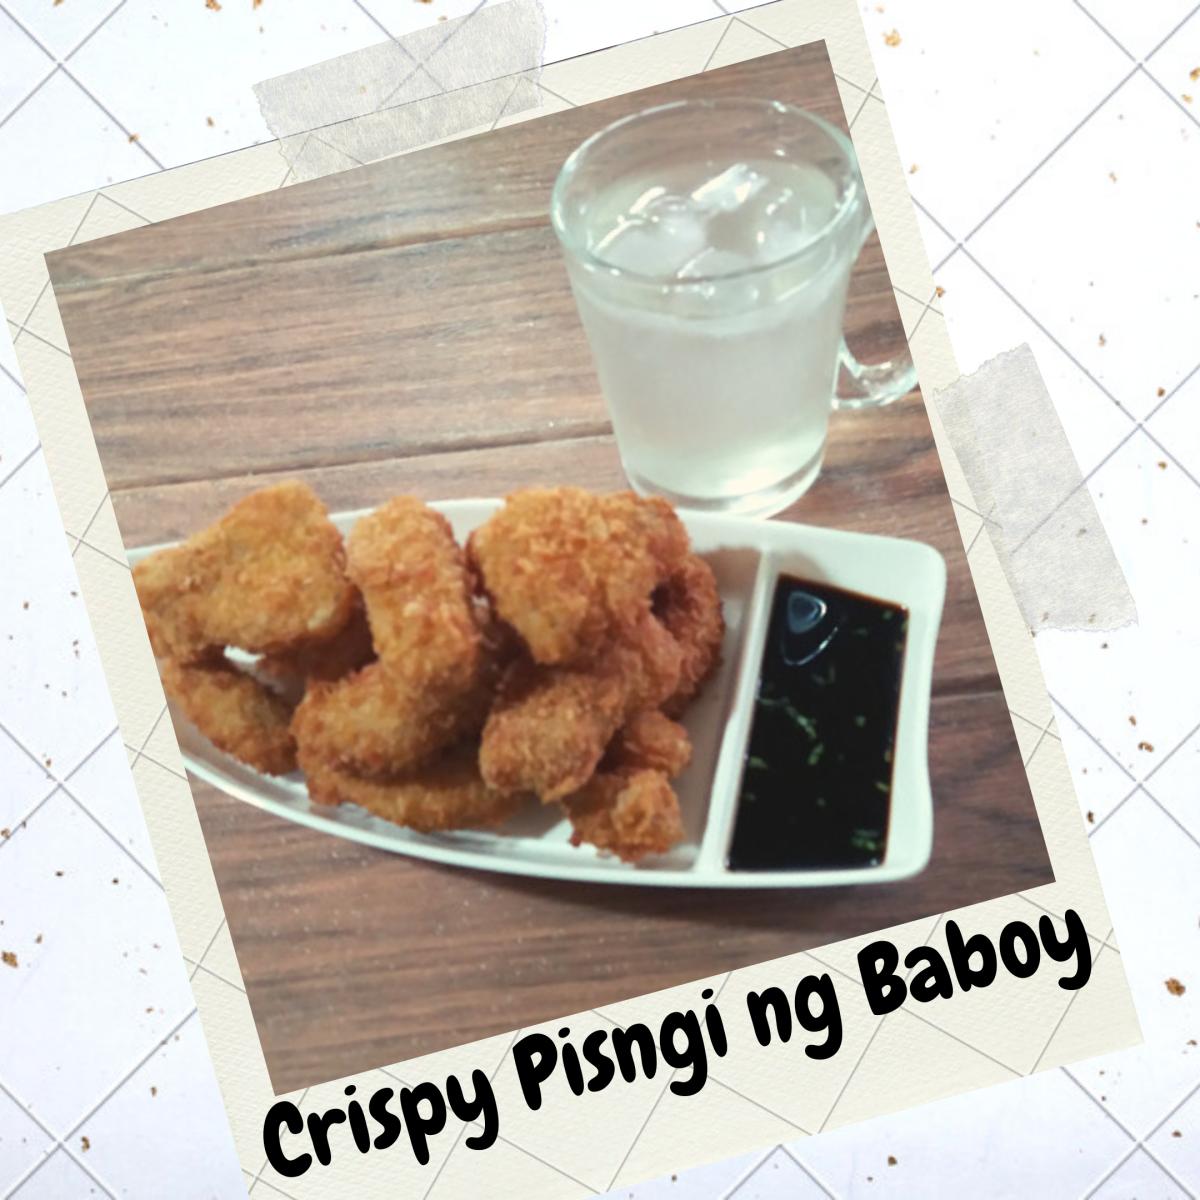 Crispy Pisngi ng Baboy: A Filipino Recipe